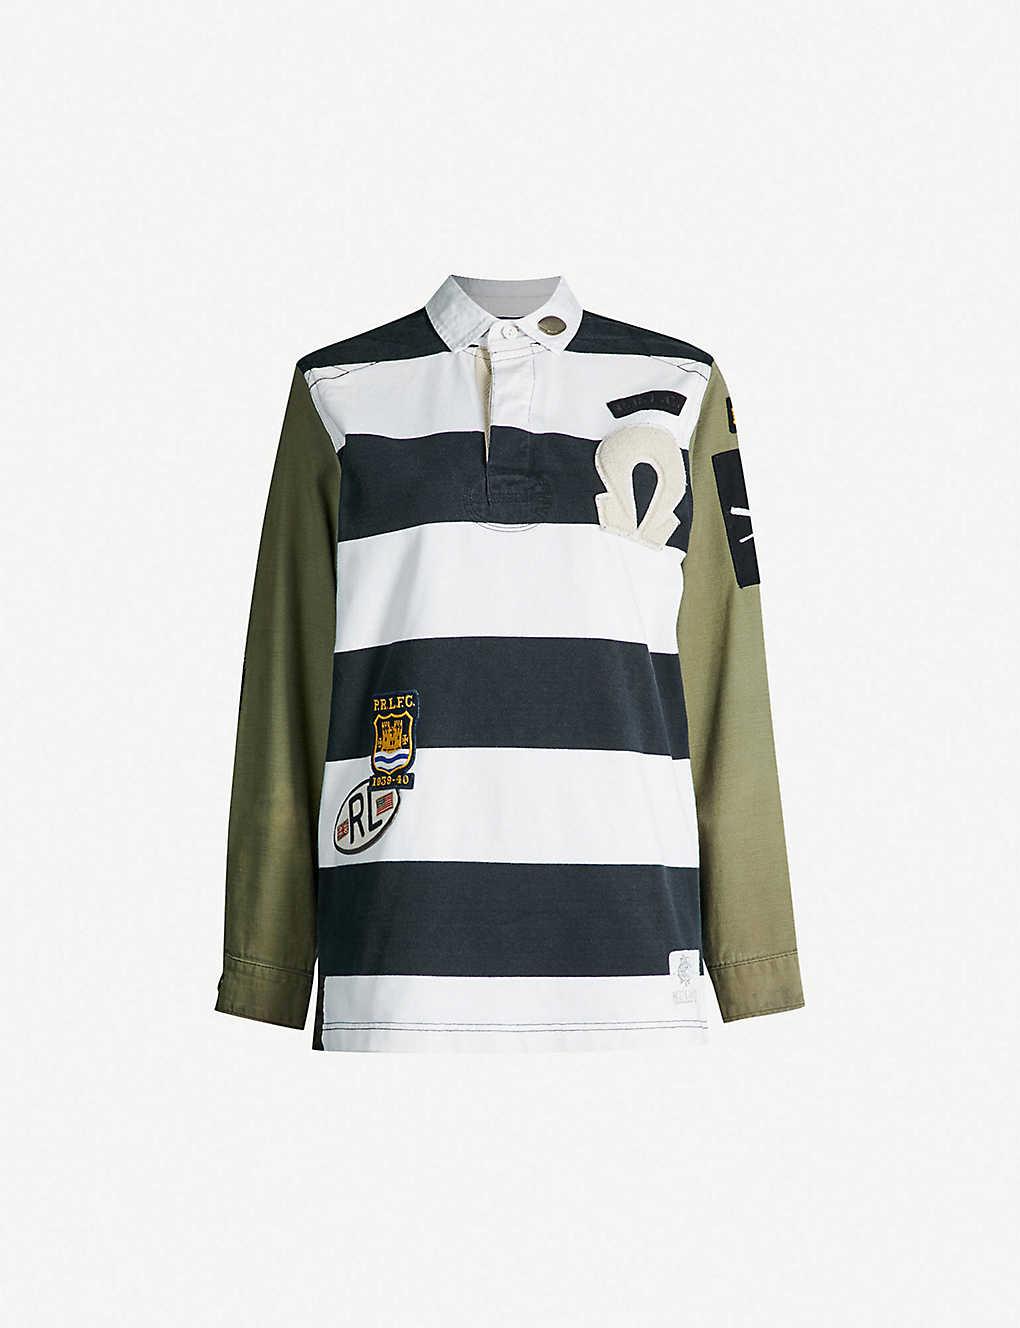 POLO RALPH LAUREN - Unisex striped cotton rugby top  ff5e146b8c899